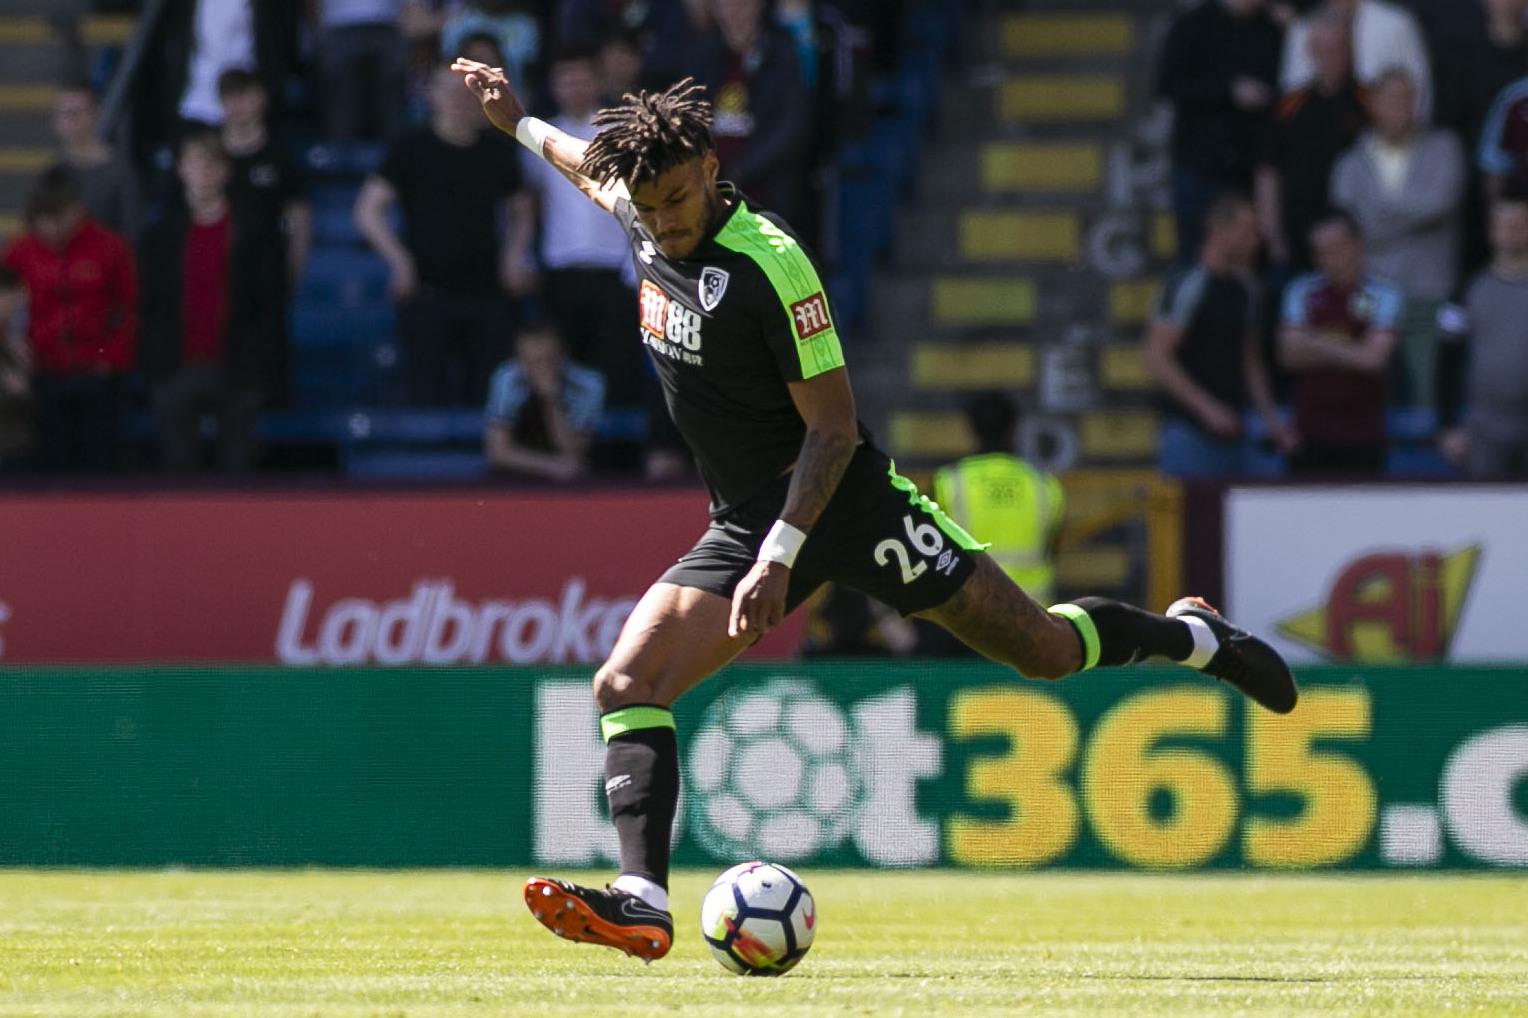 Seaman's free-kick hands Cherries second Premier League Cup win